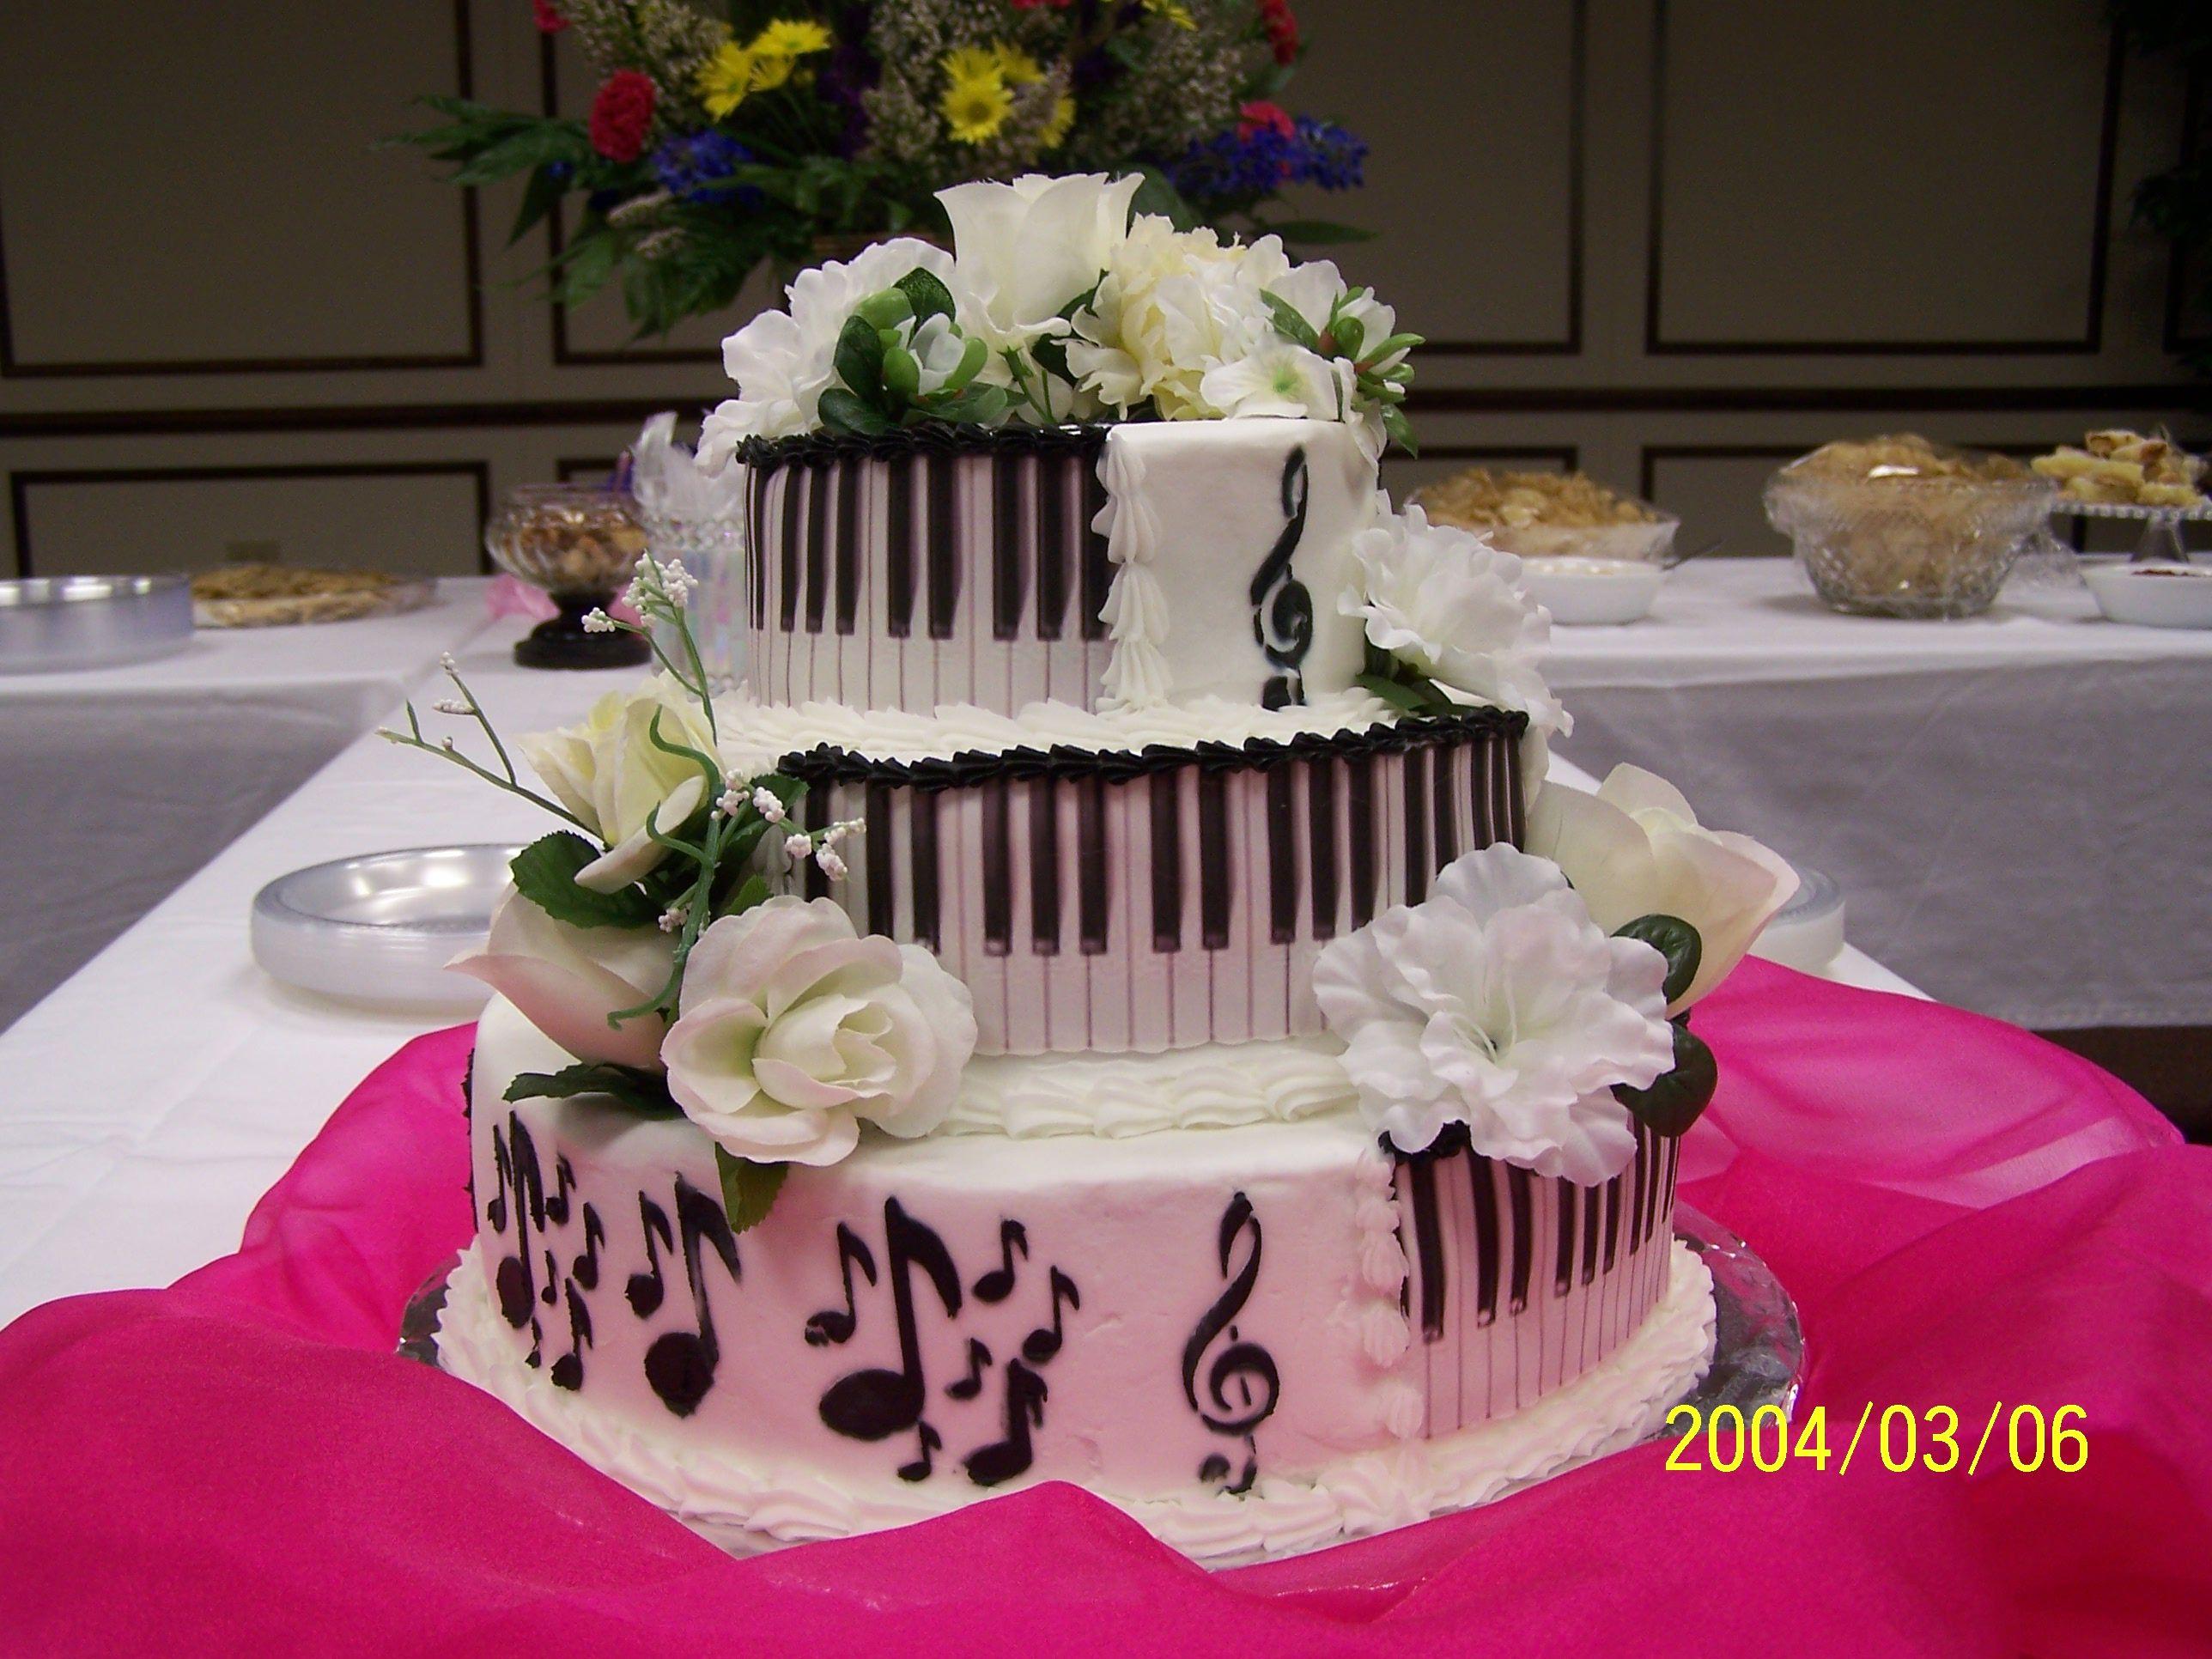 Church Anniversary Cakes Ideas 57227 Cake For 35th Anniver